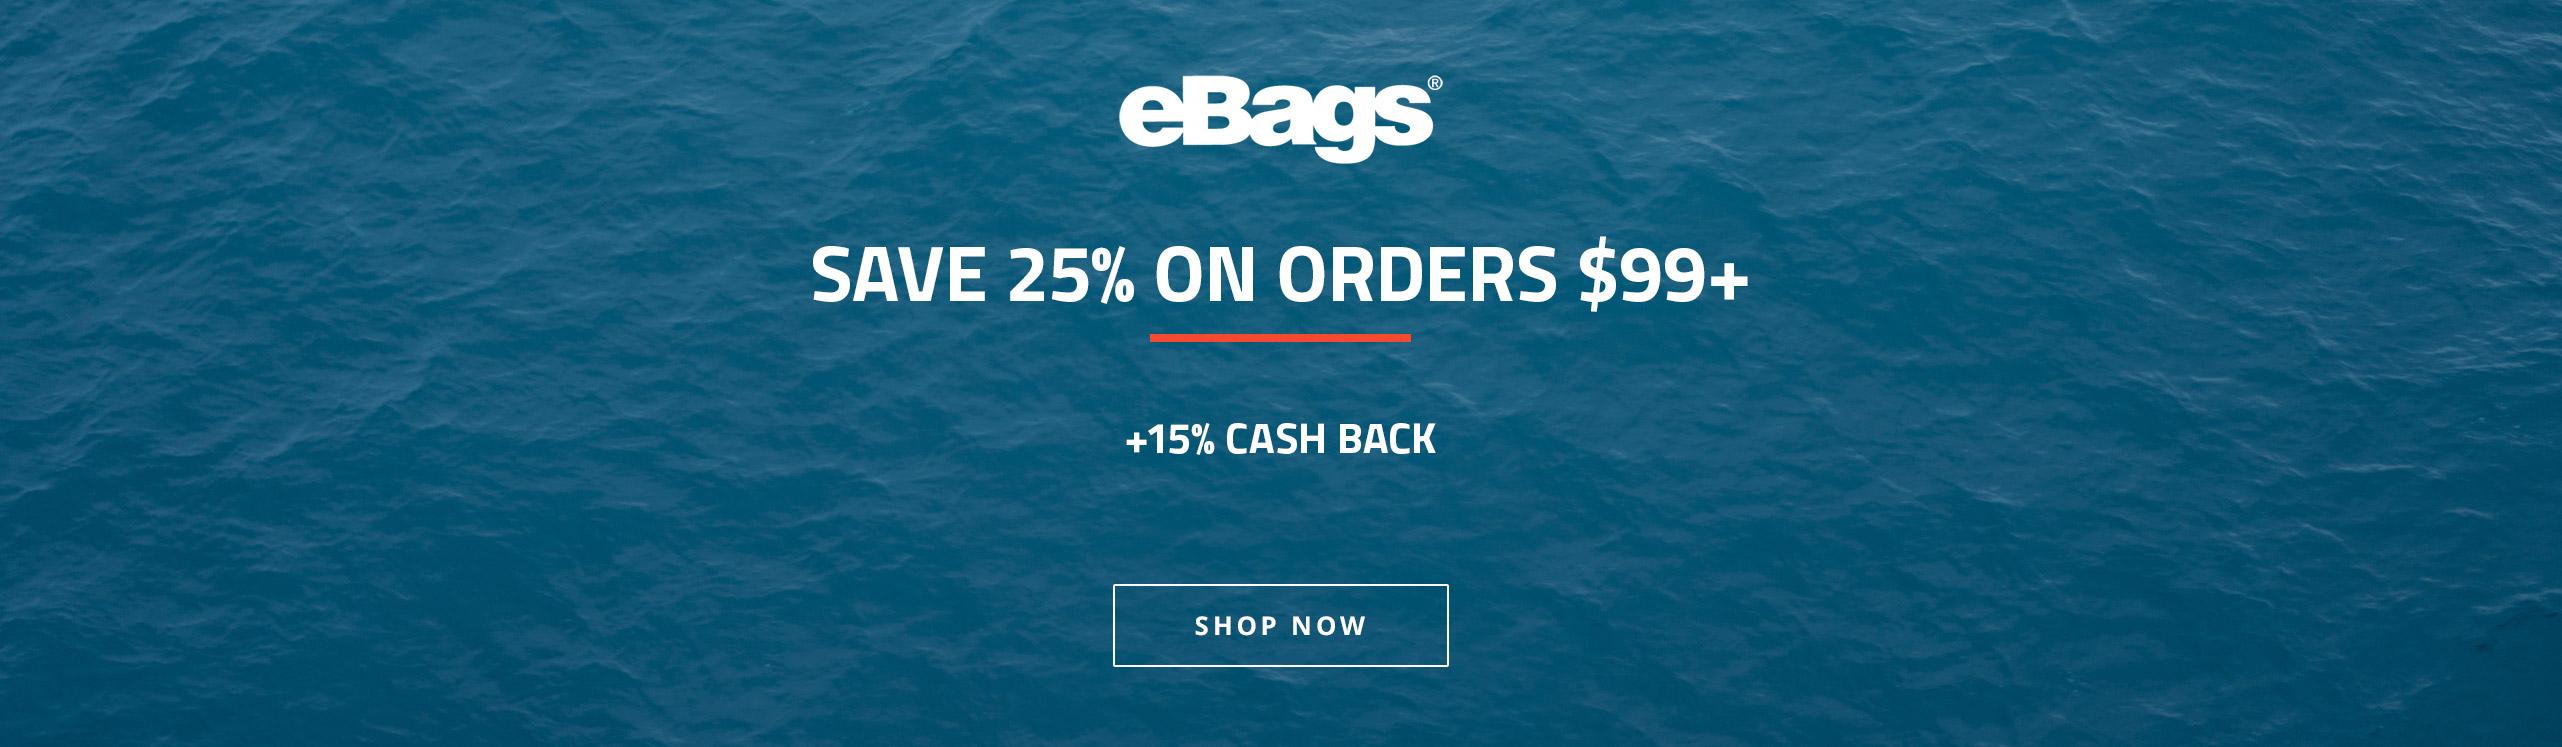 eBags (8%) Save 25% on Orders $99+